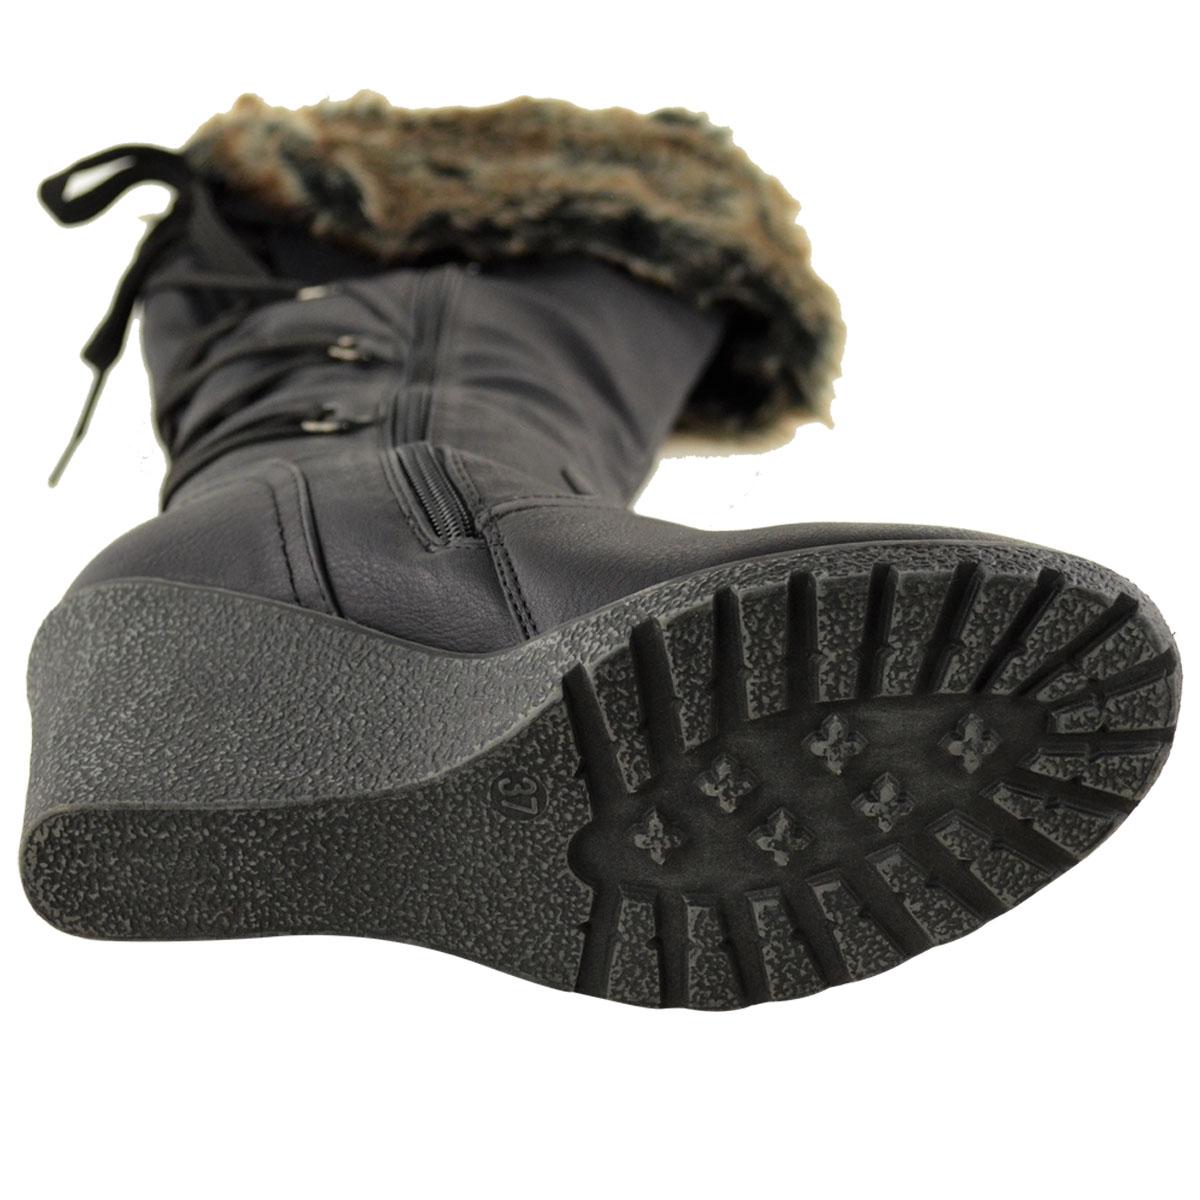 Womens-Ladies-Wedge-Low-Heel-Winter-Knee-Boots-Warm-Faux-Fur-Fleece-Size-UK thumbnail 11